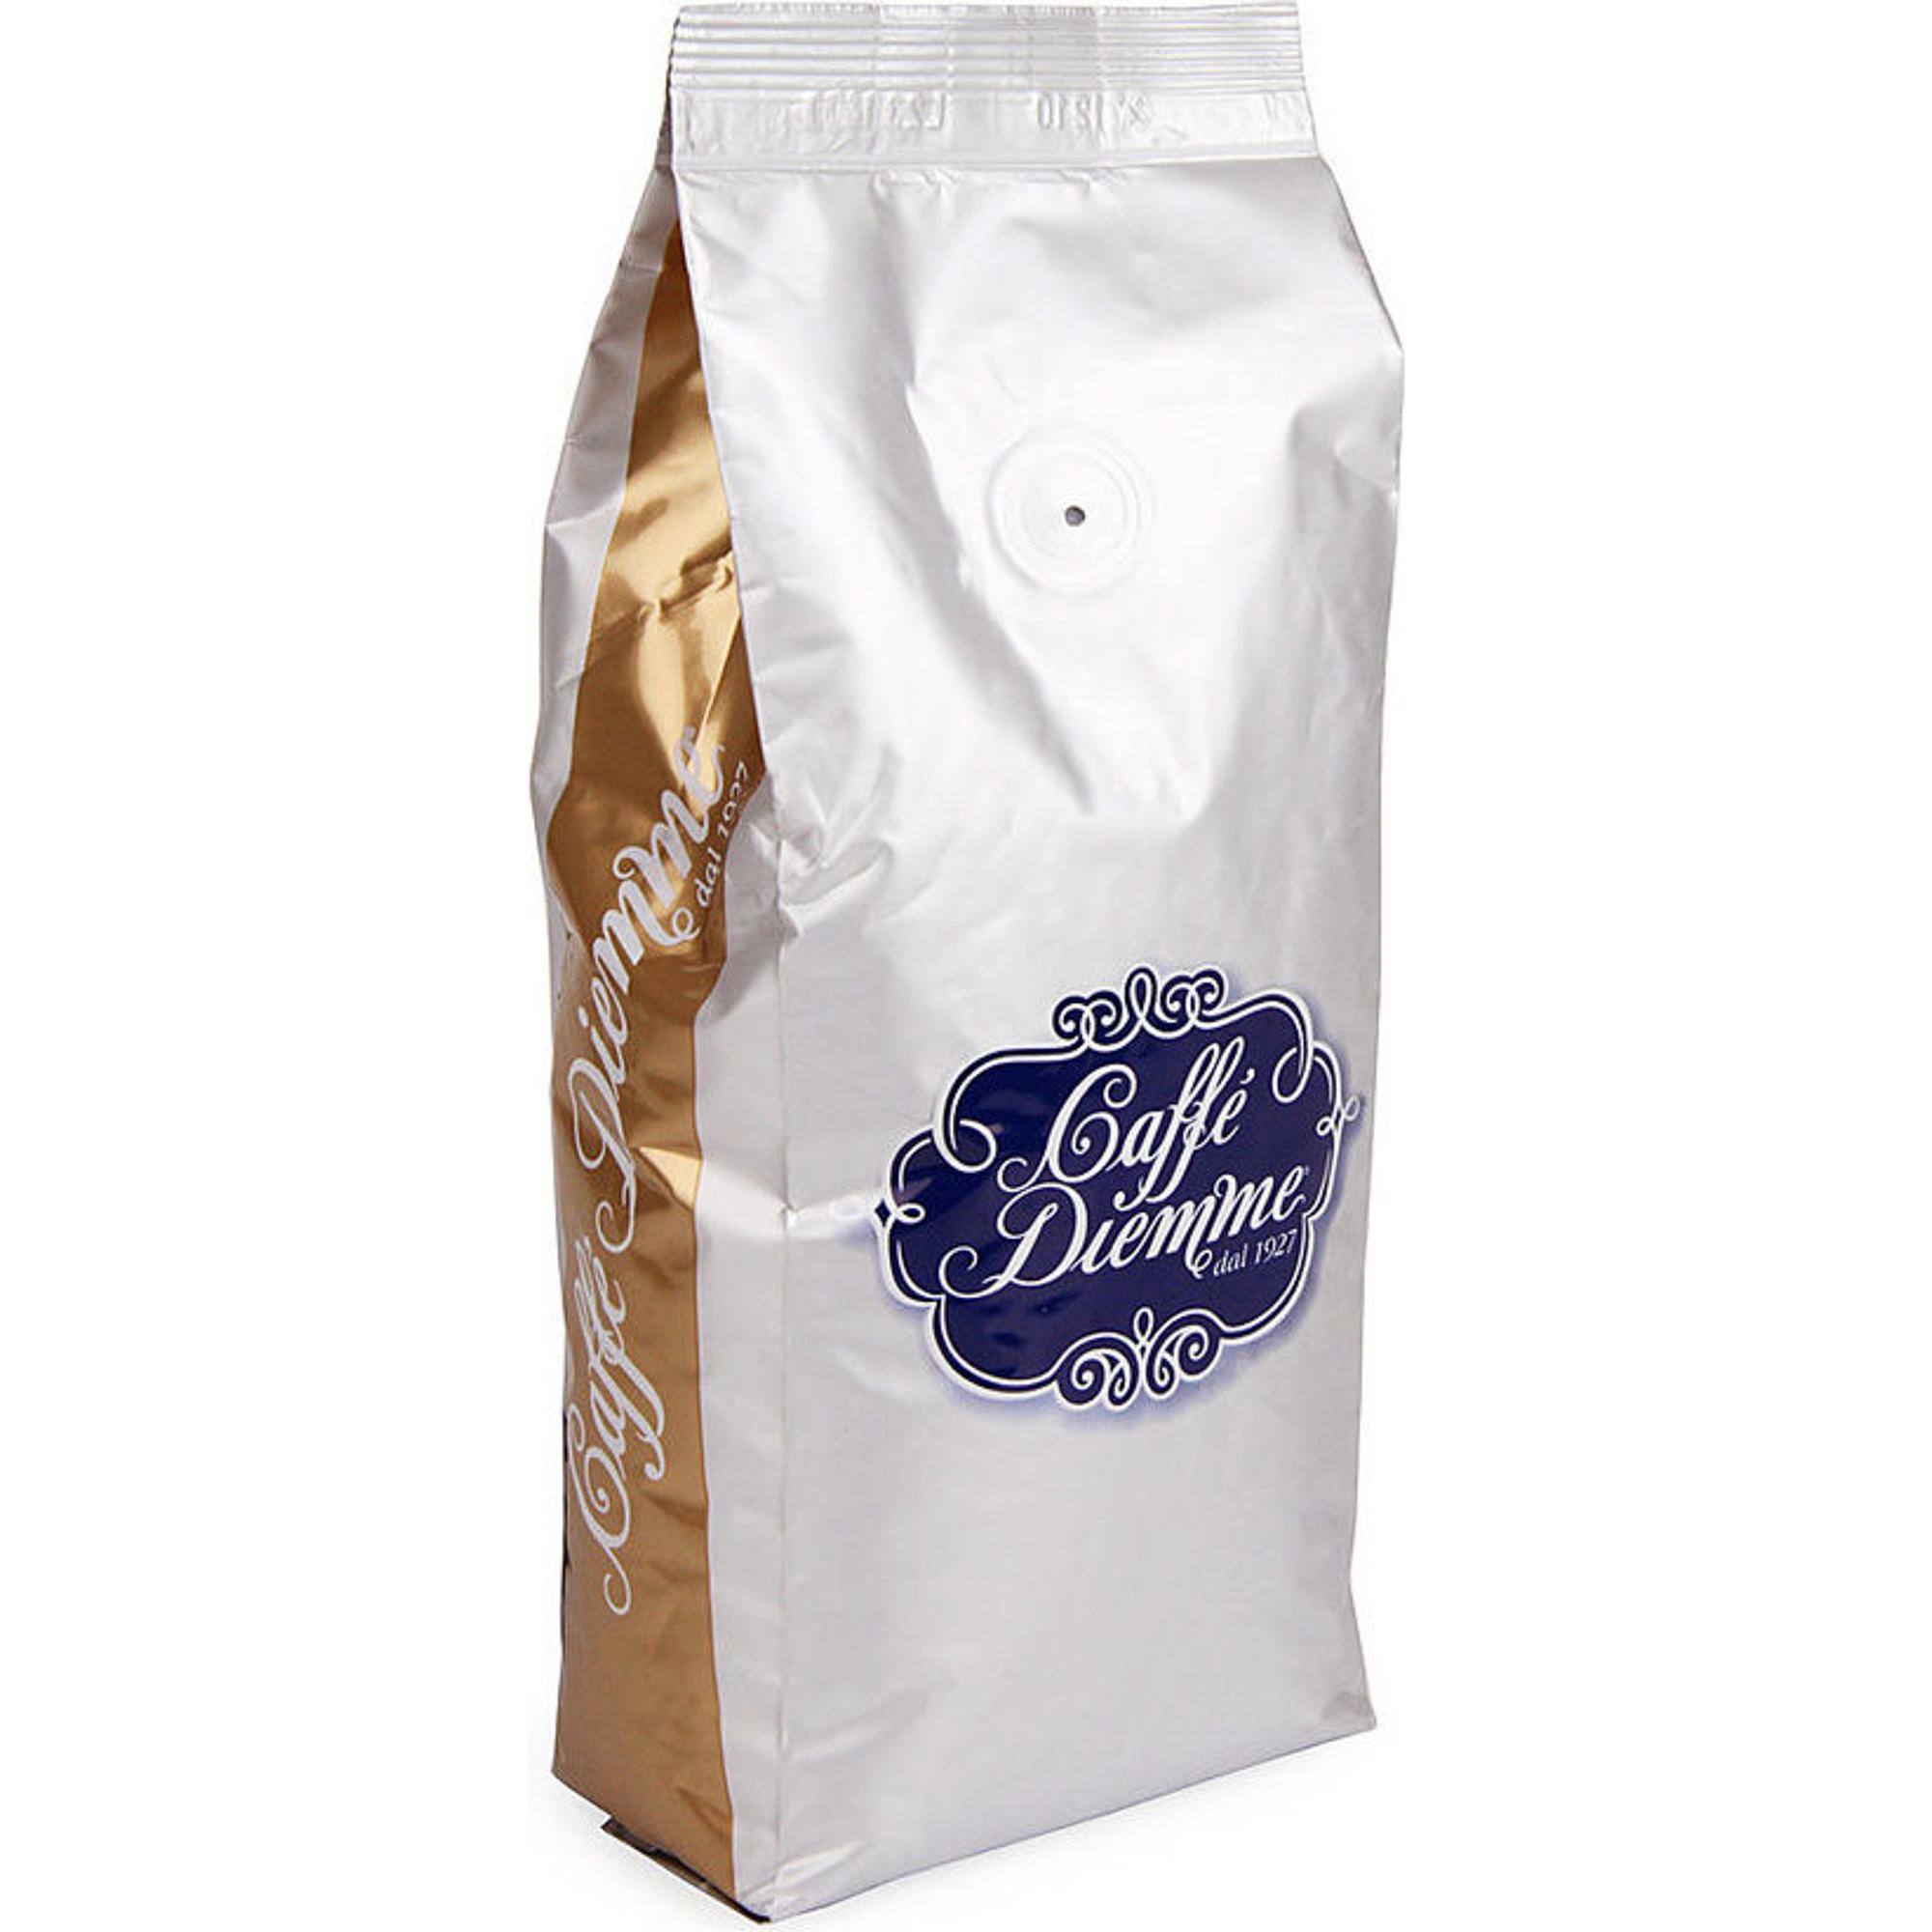 Кофе в зернах Diemme Caffe Miscela Oro 500 г кофе в зернах caffe diemme miscela oro арабика 500 г